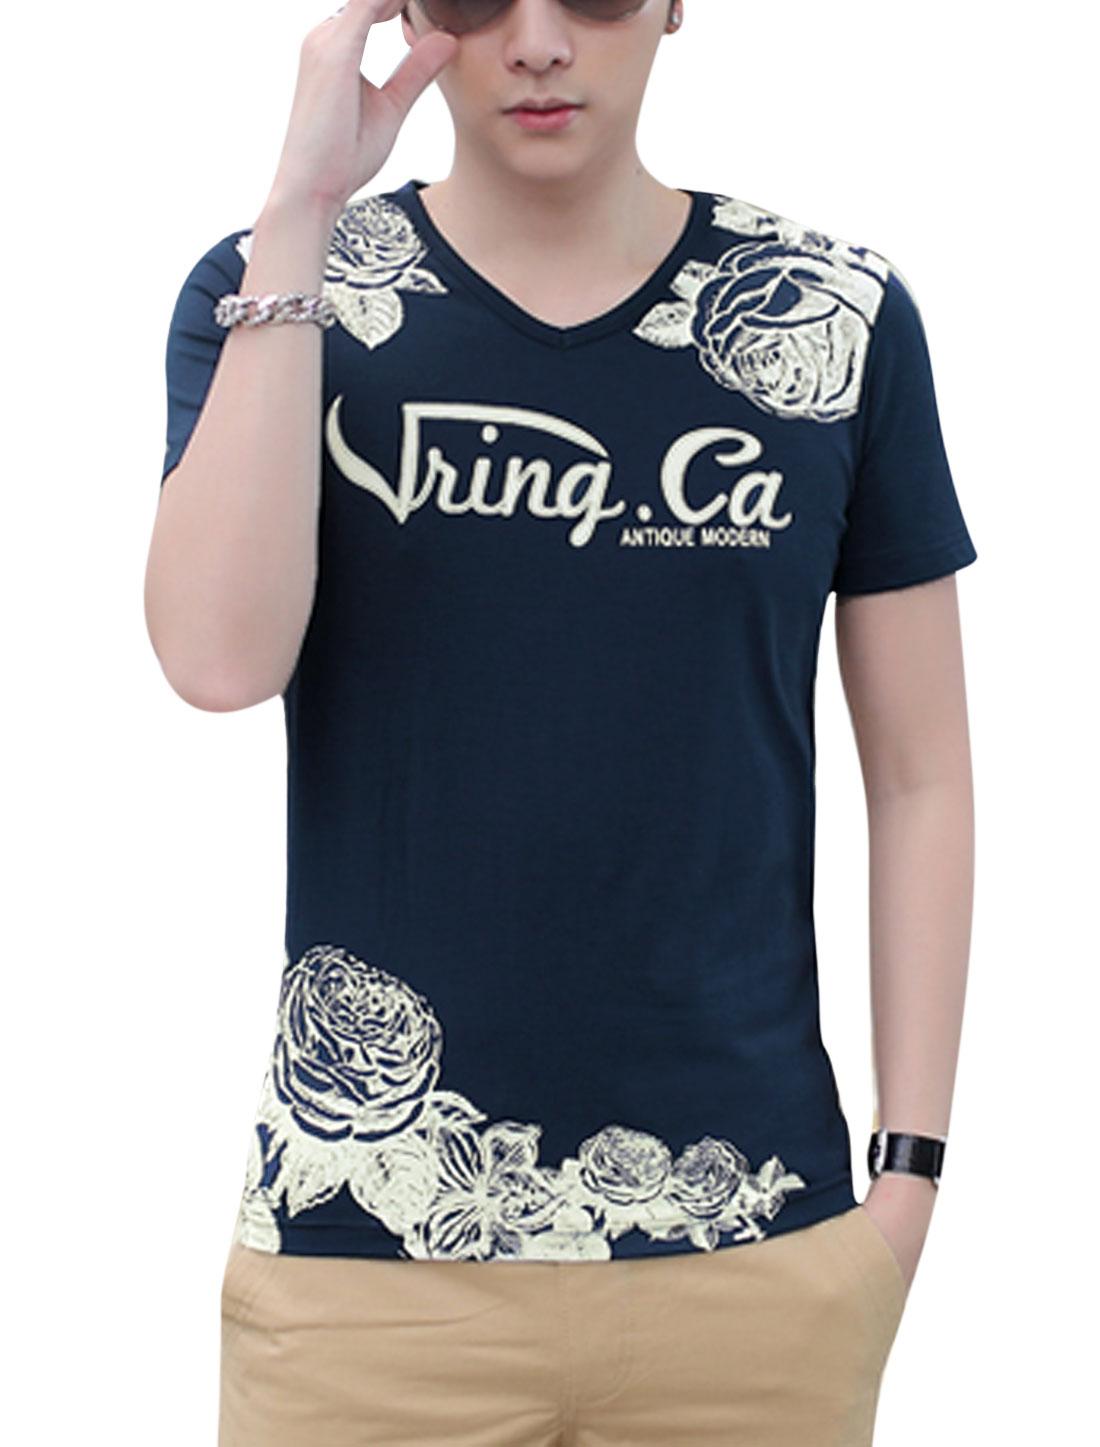 Man Floral Letters Prints V Neck Short Sleeves Casual T-shirt Dark Blue M